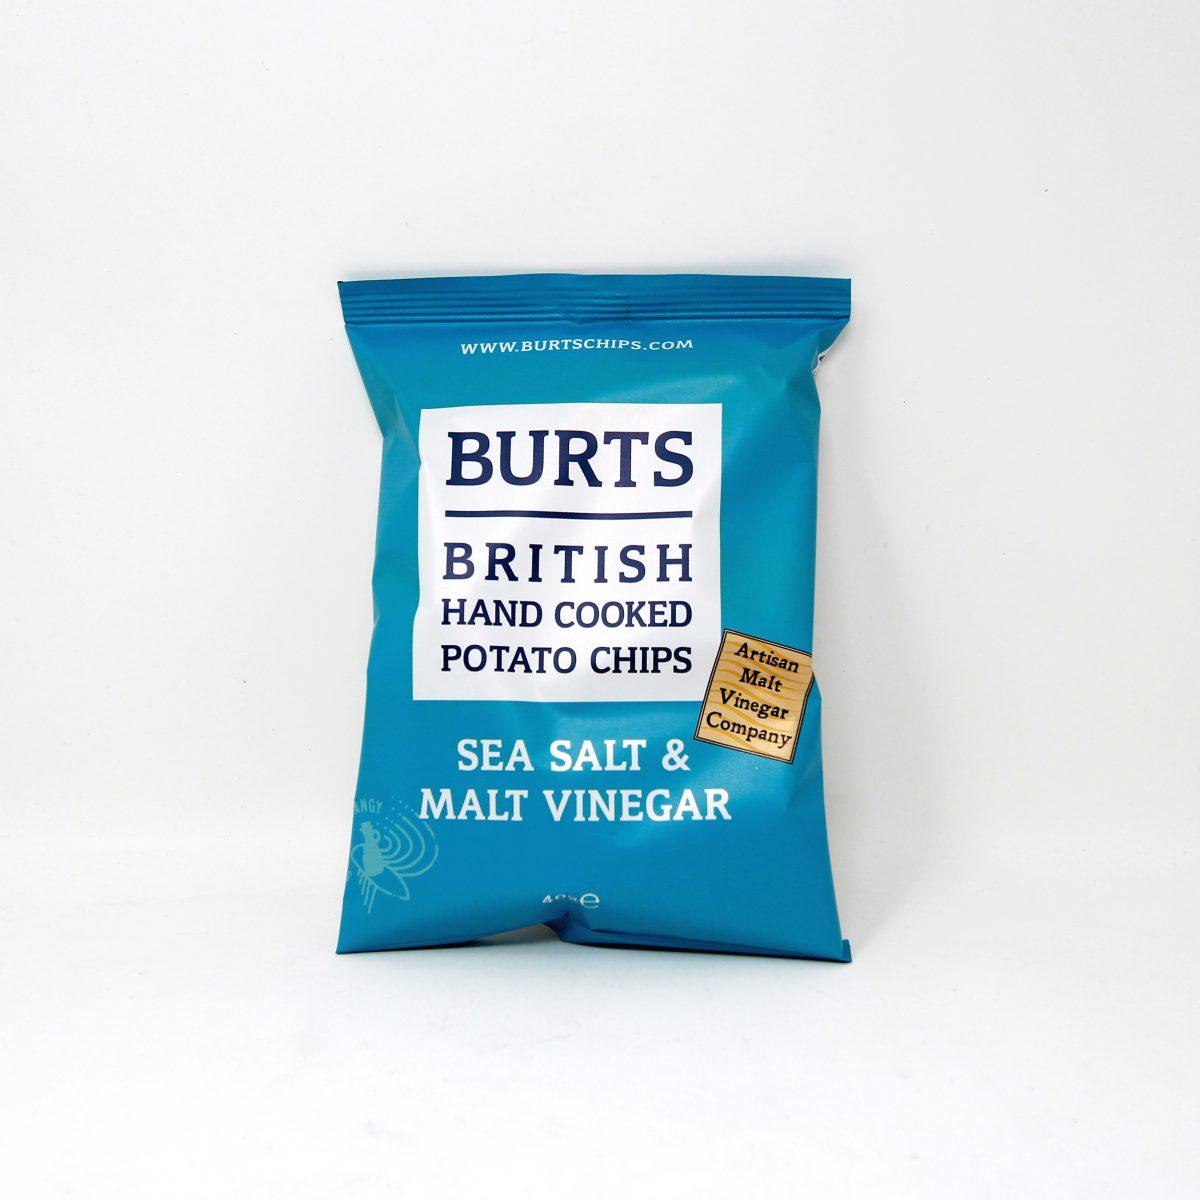 Burts-Sea-Salt-&-Malt-Vinegar Chips